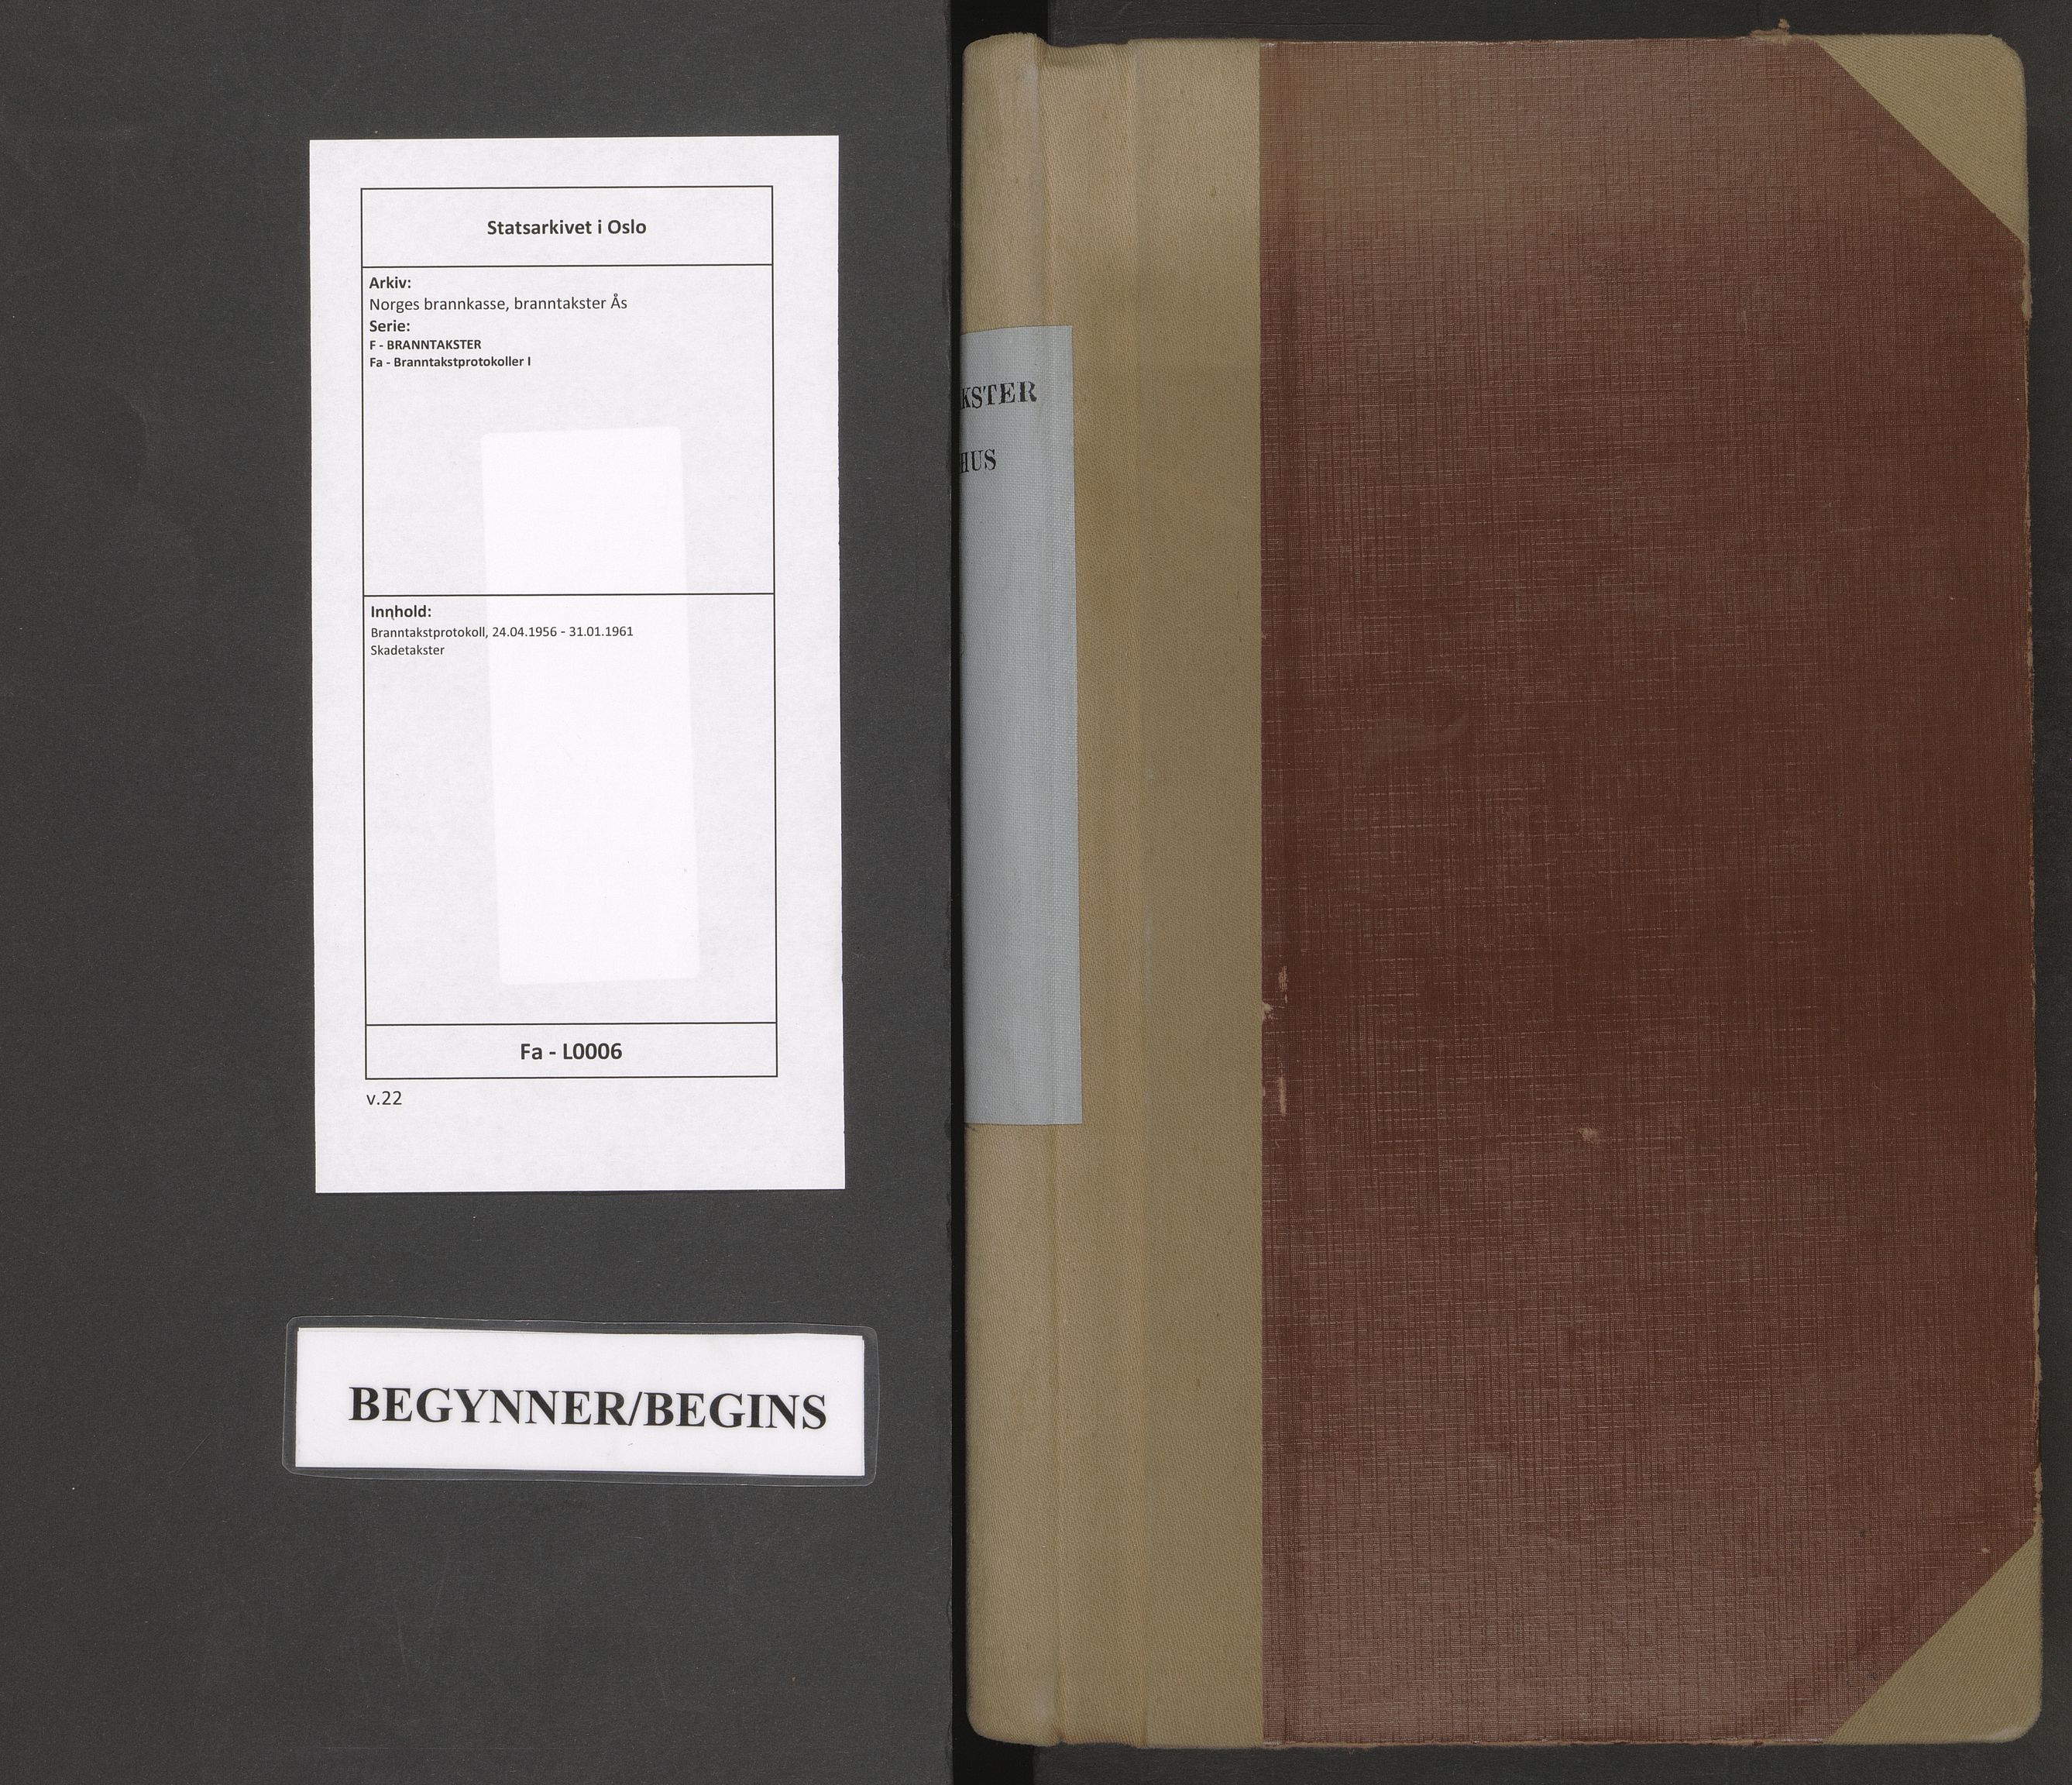 SAO, Norges brannkasse, branntakster Ås, F/Fa/L0006: Branntakstprotokoll, 1956-1961